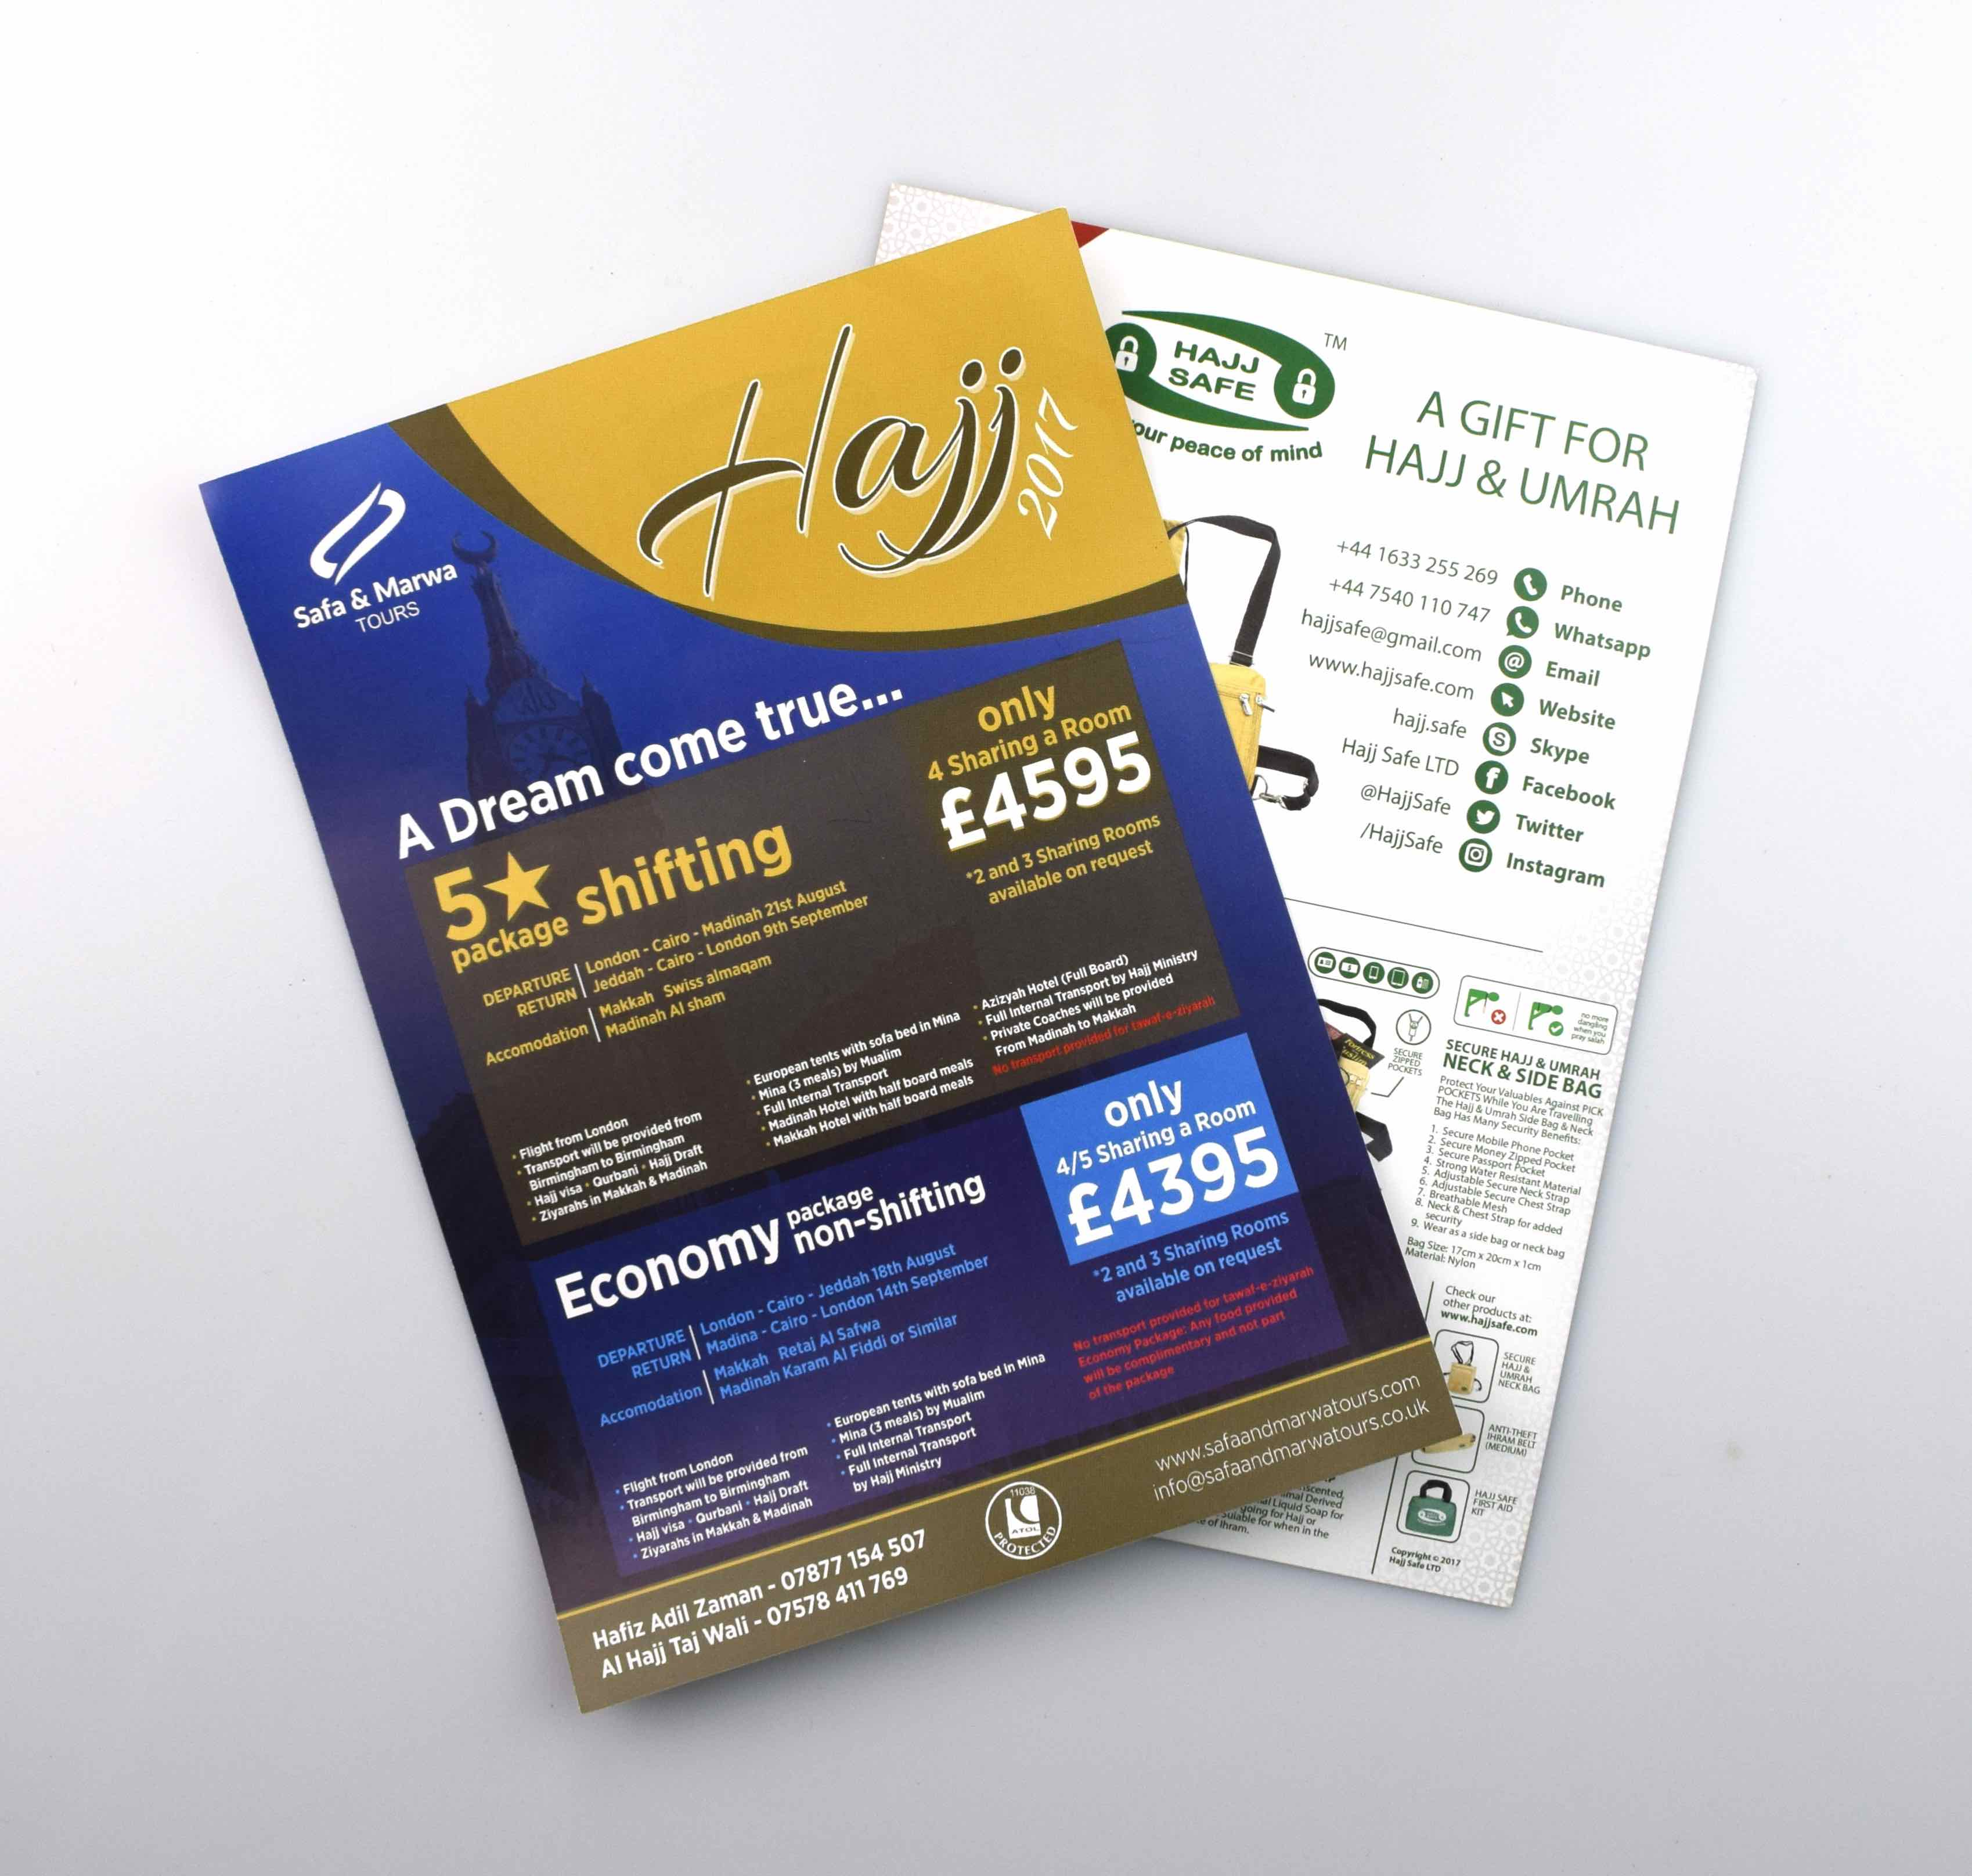 hajj-and-umrah-leaflet-print-free.jpg